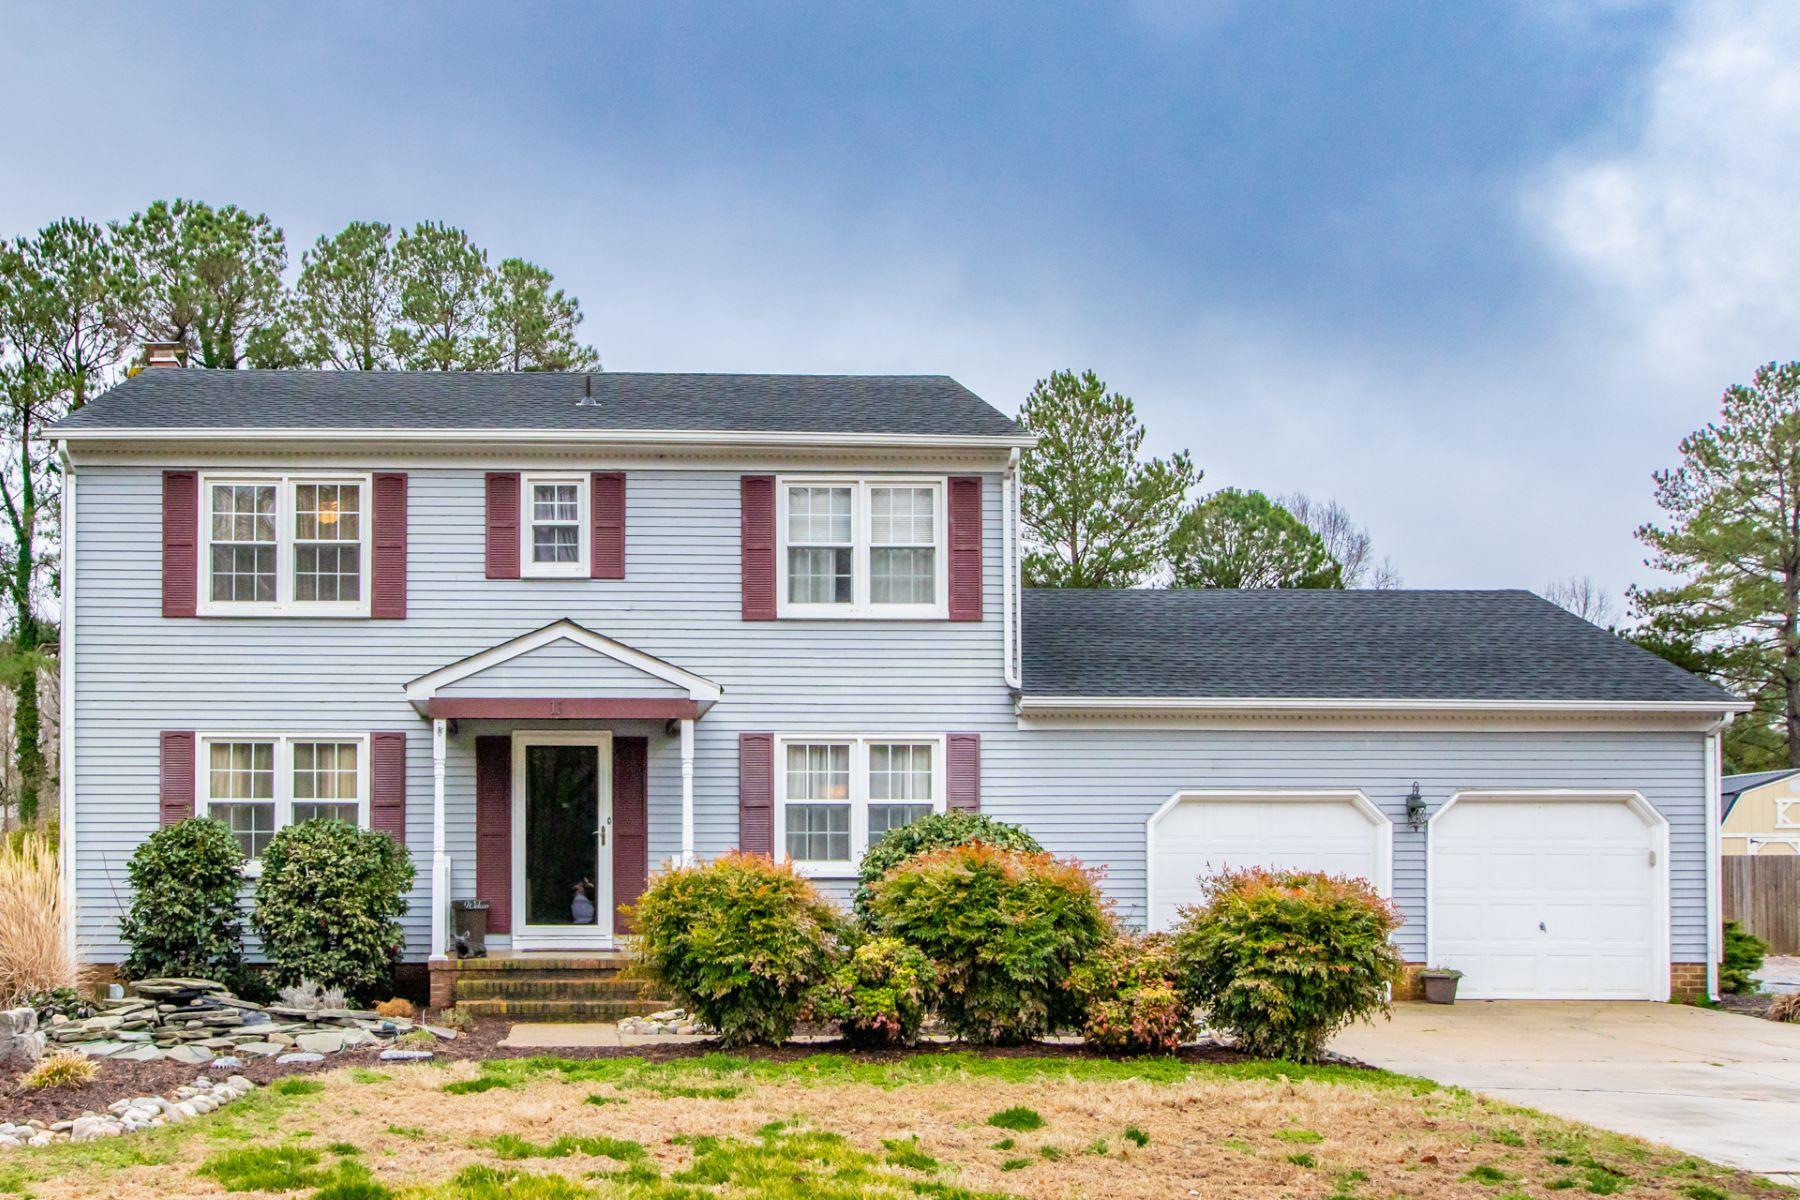 Single Family Home for Sale at CARISBROOKE 13 Nelson Maine Carrollton, Virginia 23314 United States